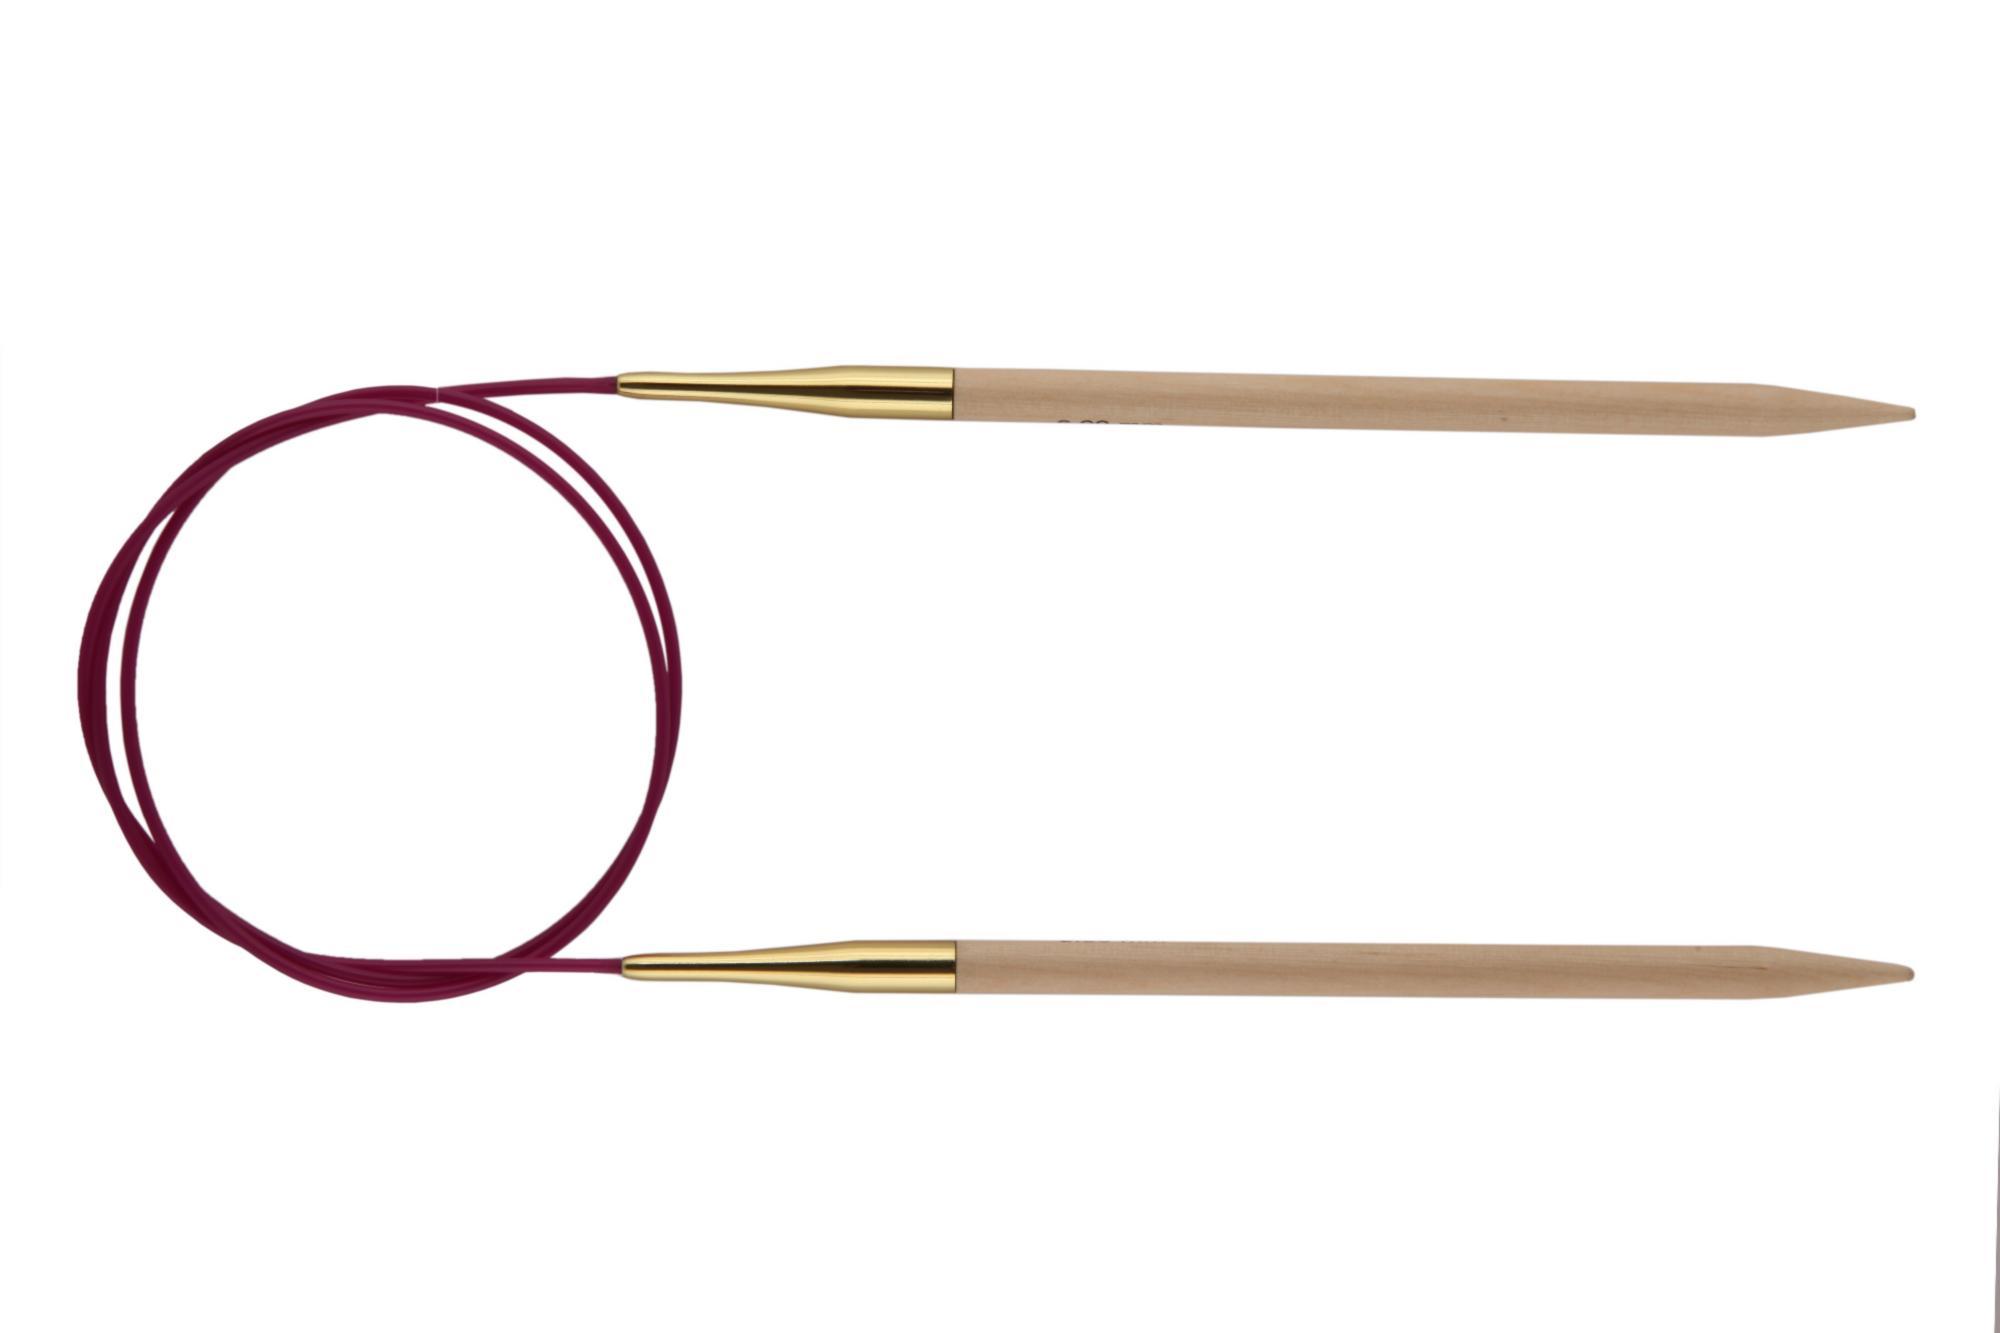 Спицы круговые 80 см Basix Birch Wood KnitPro, 35384, 4.00 мм